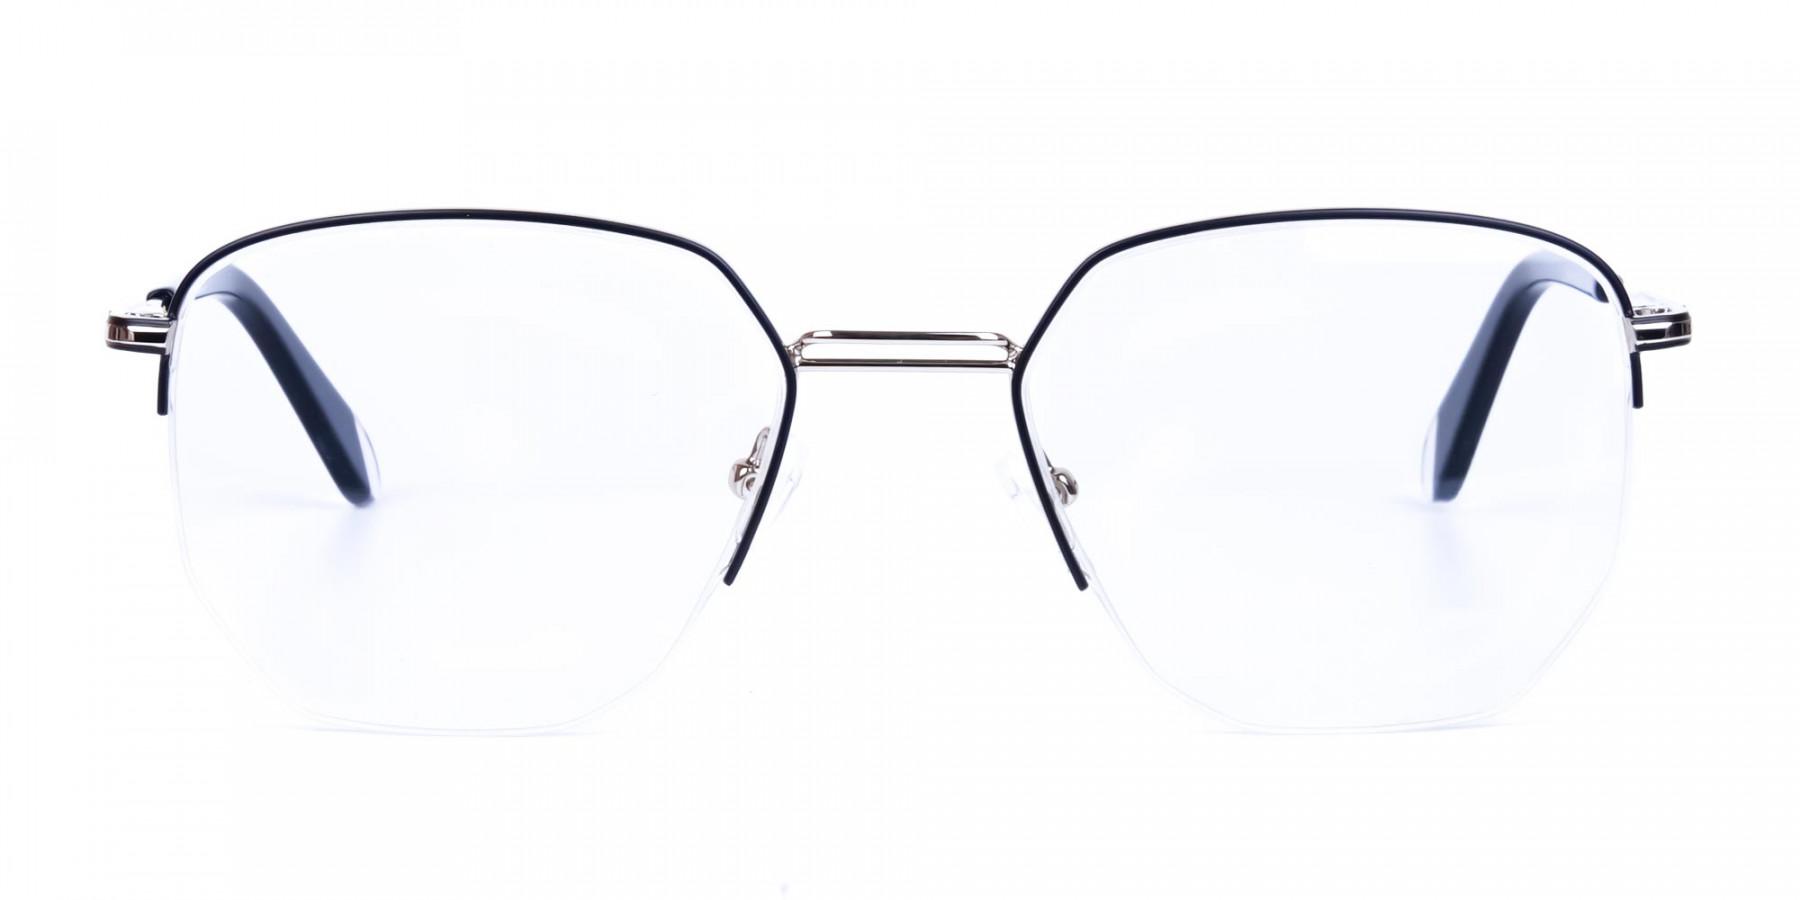 Black-Silver-Geometric-Aviator-Glasses-1